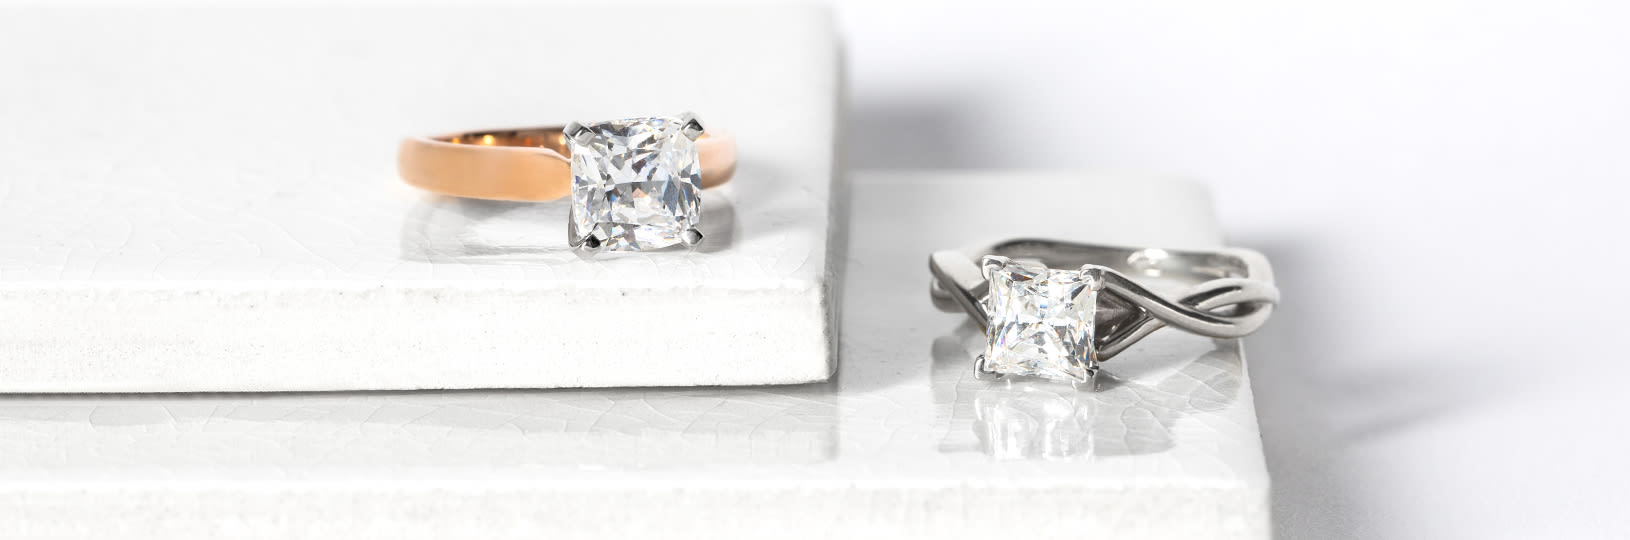 A princess cut and cushion cut engagement ring